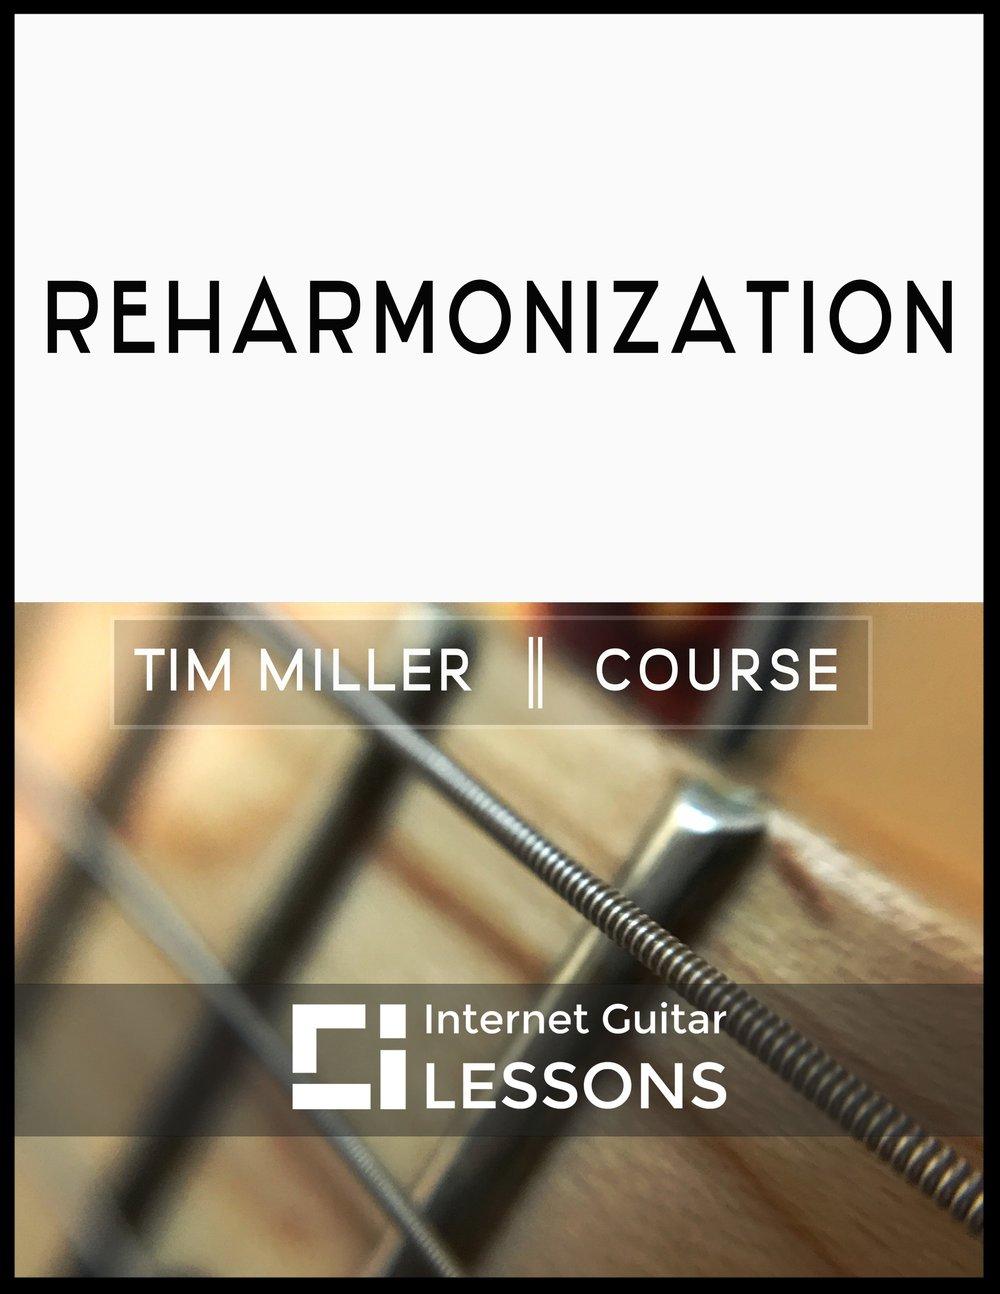 Reharmonization 10-15-17 flat.jpg